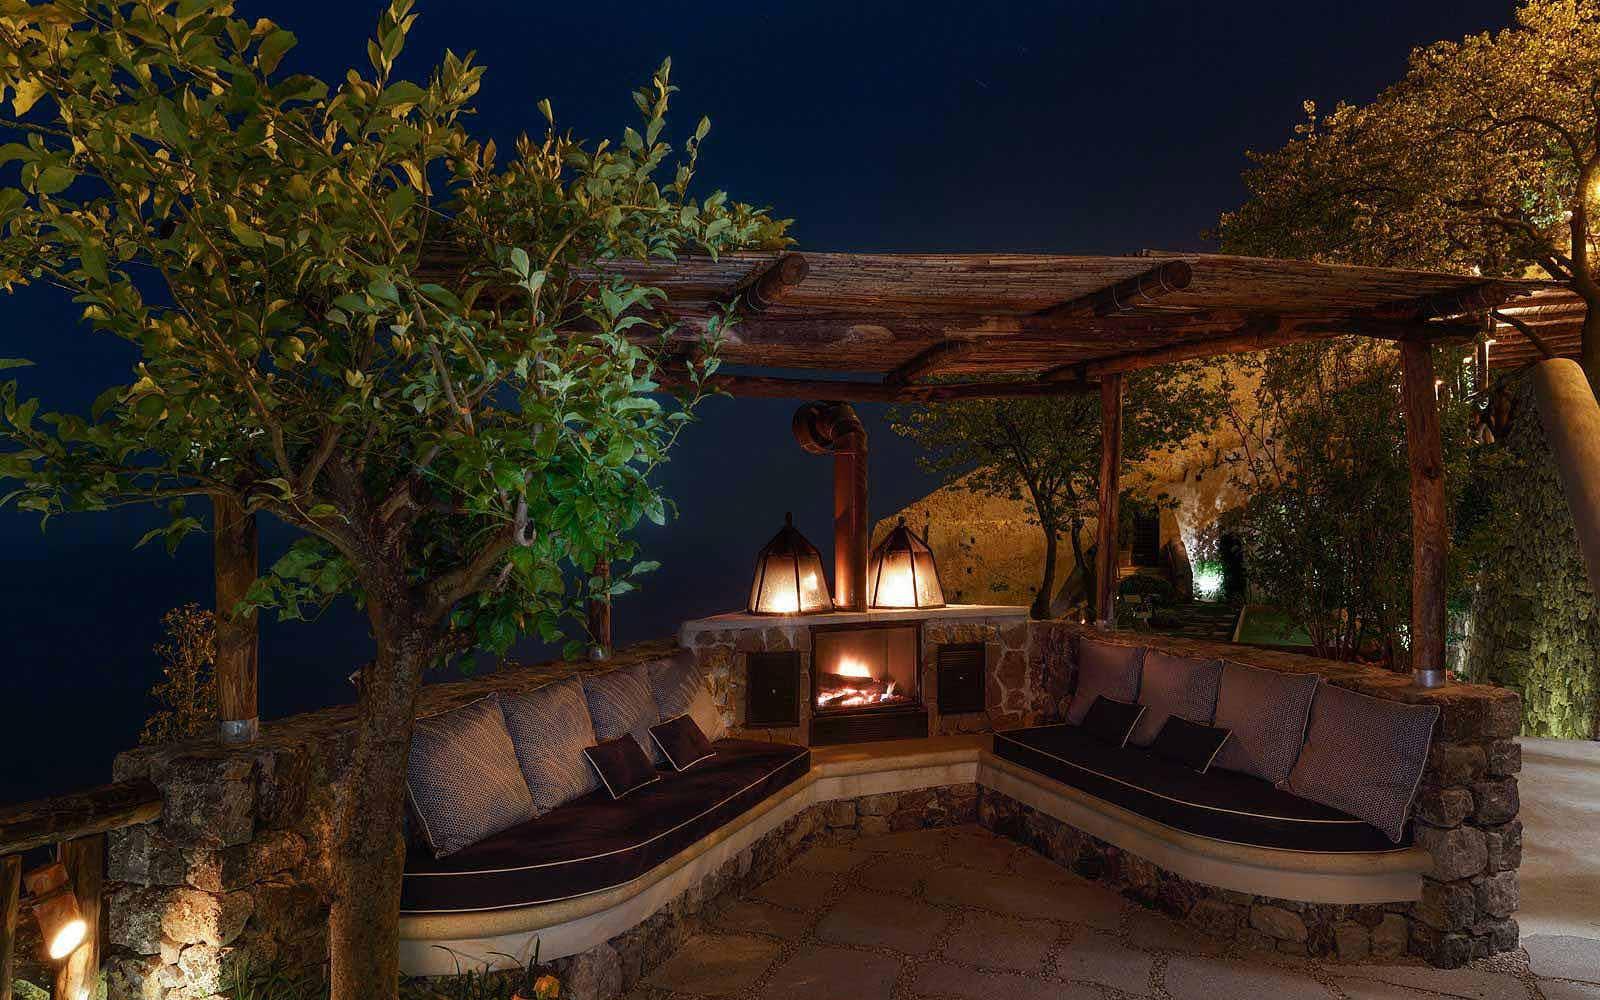 Outdoor fireplace at Monastero Santa Rosa